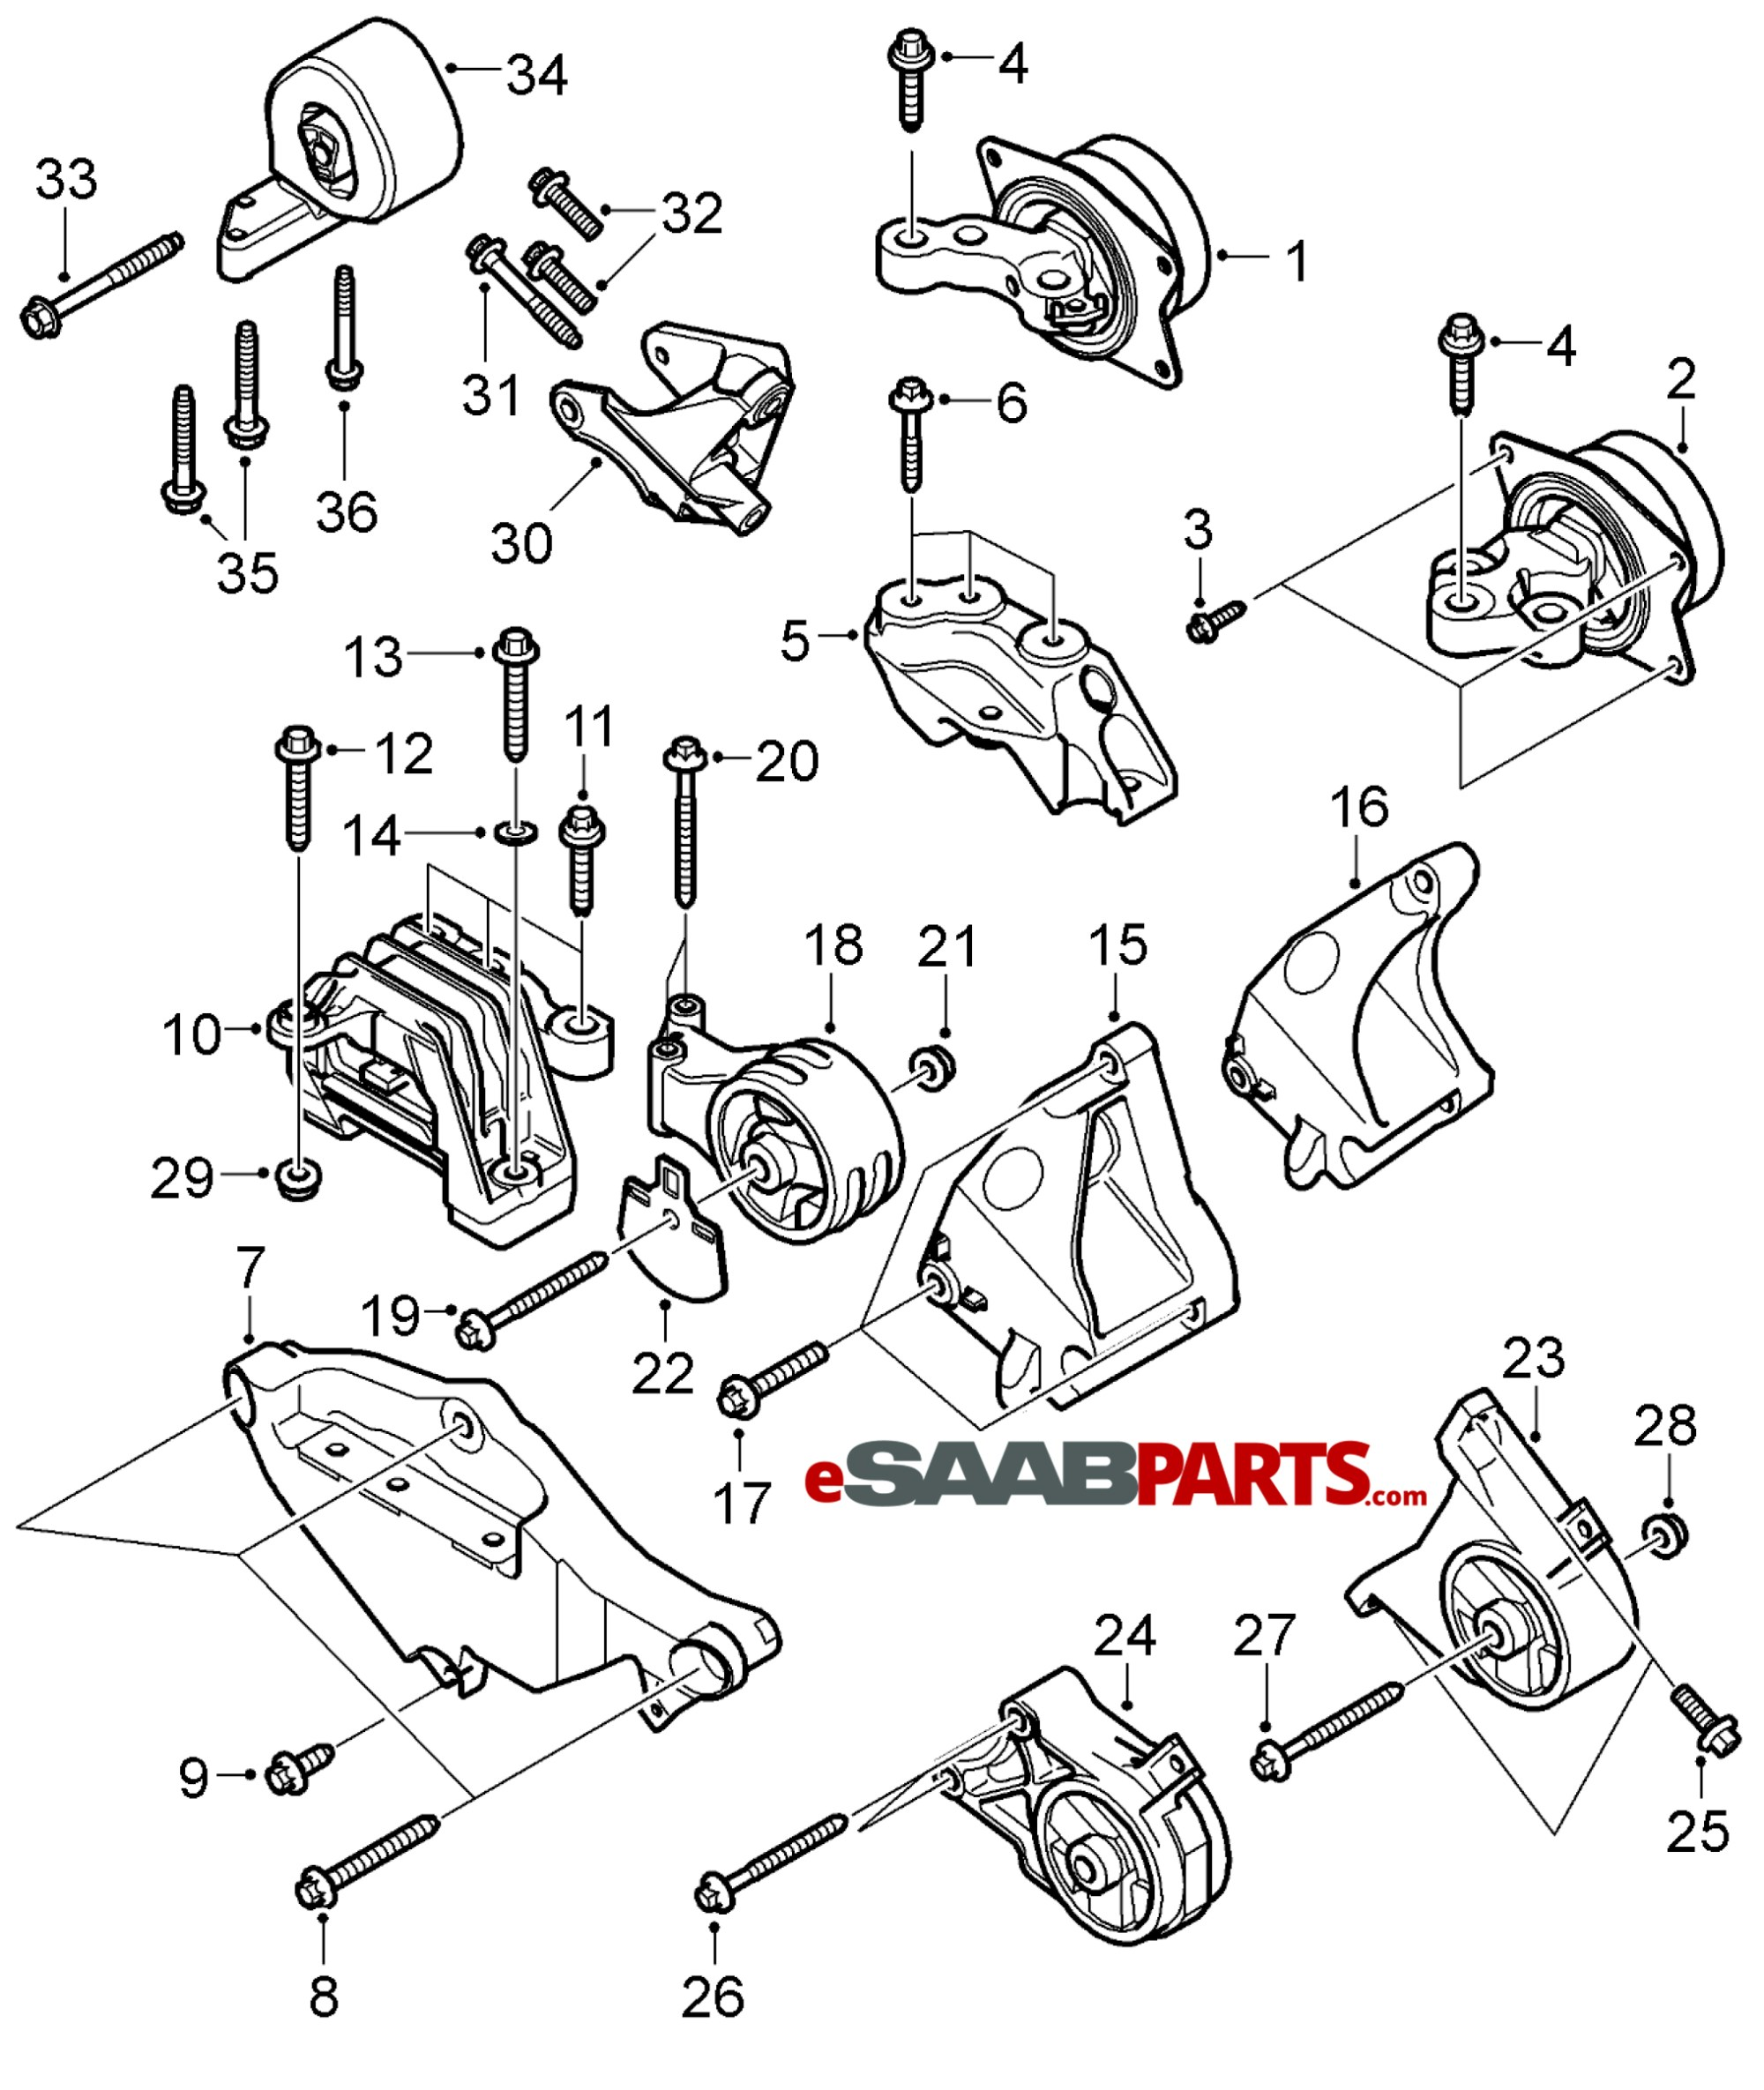 hight resolution of saab 9 5 v6 engine mount diagram honda coolant temp sensor saab v6 turbo engine diagram saab v6 turbo